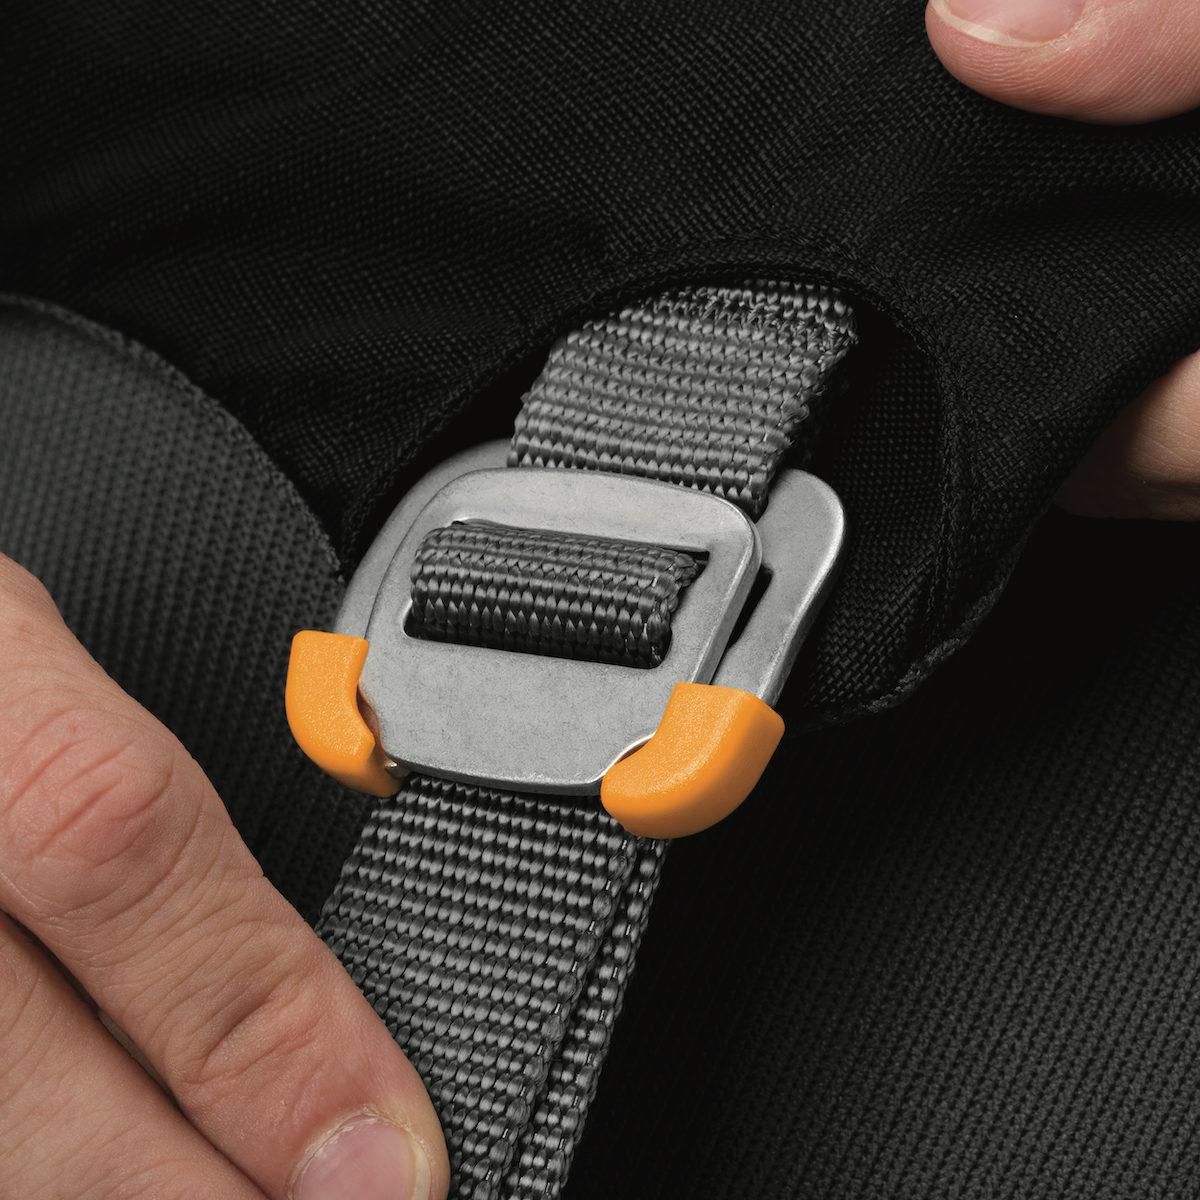 Ruffwear Load-Up Harness